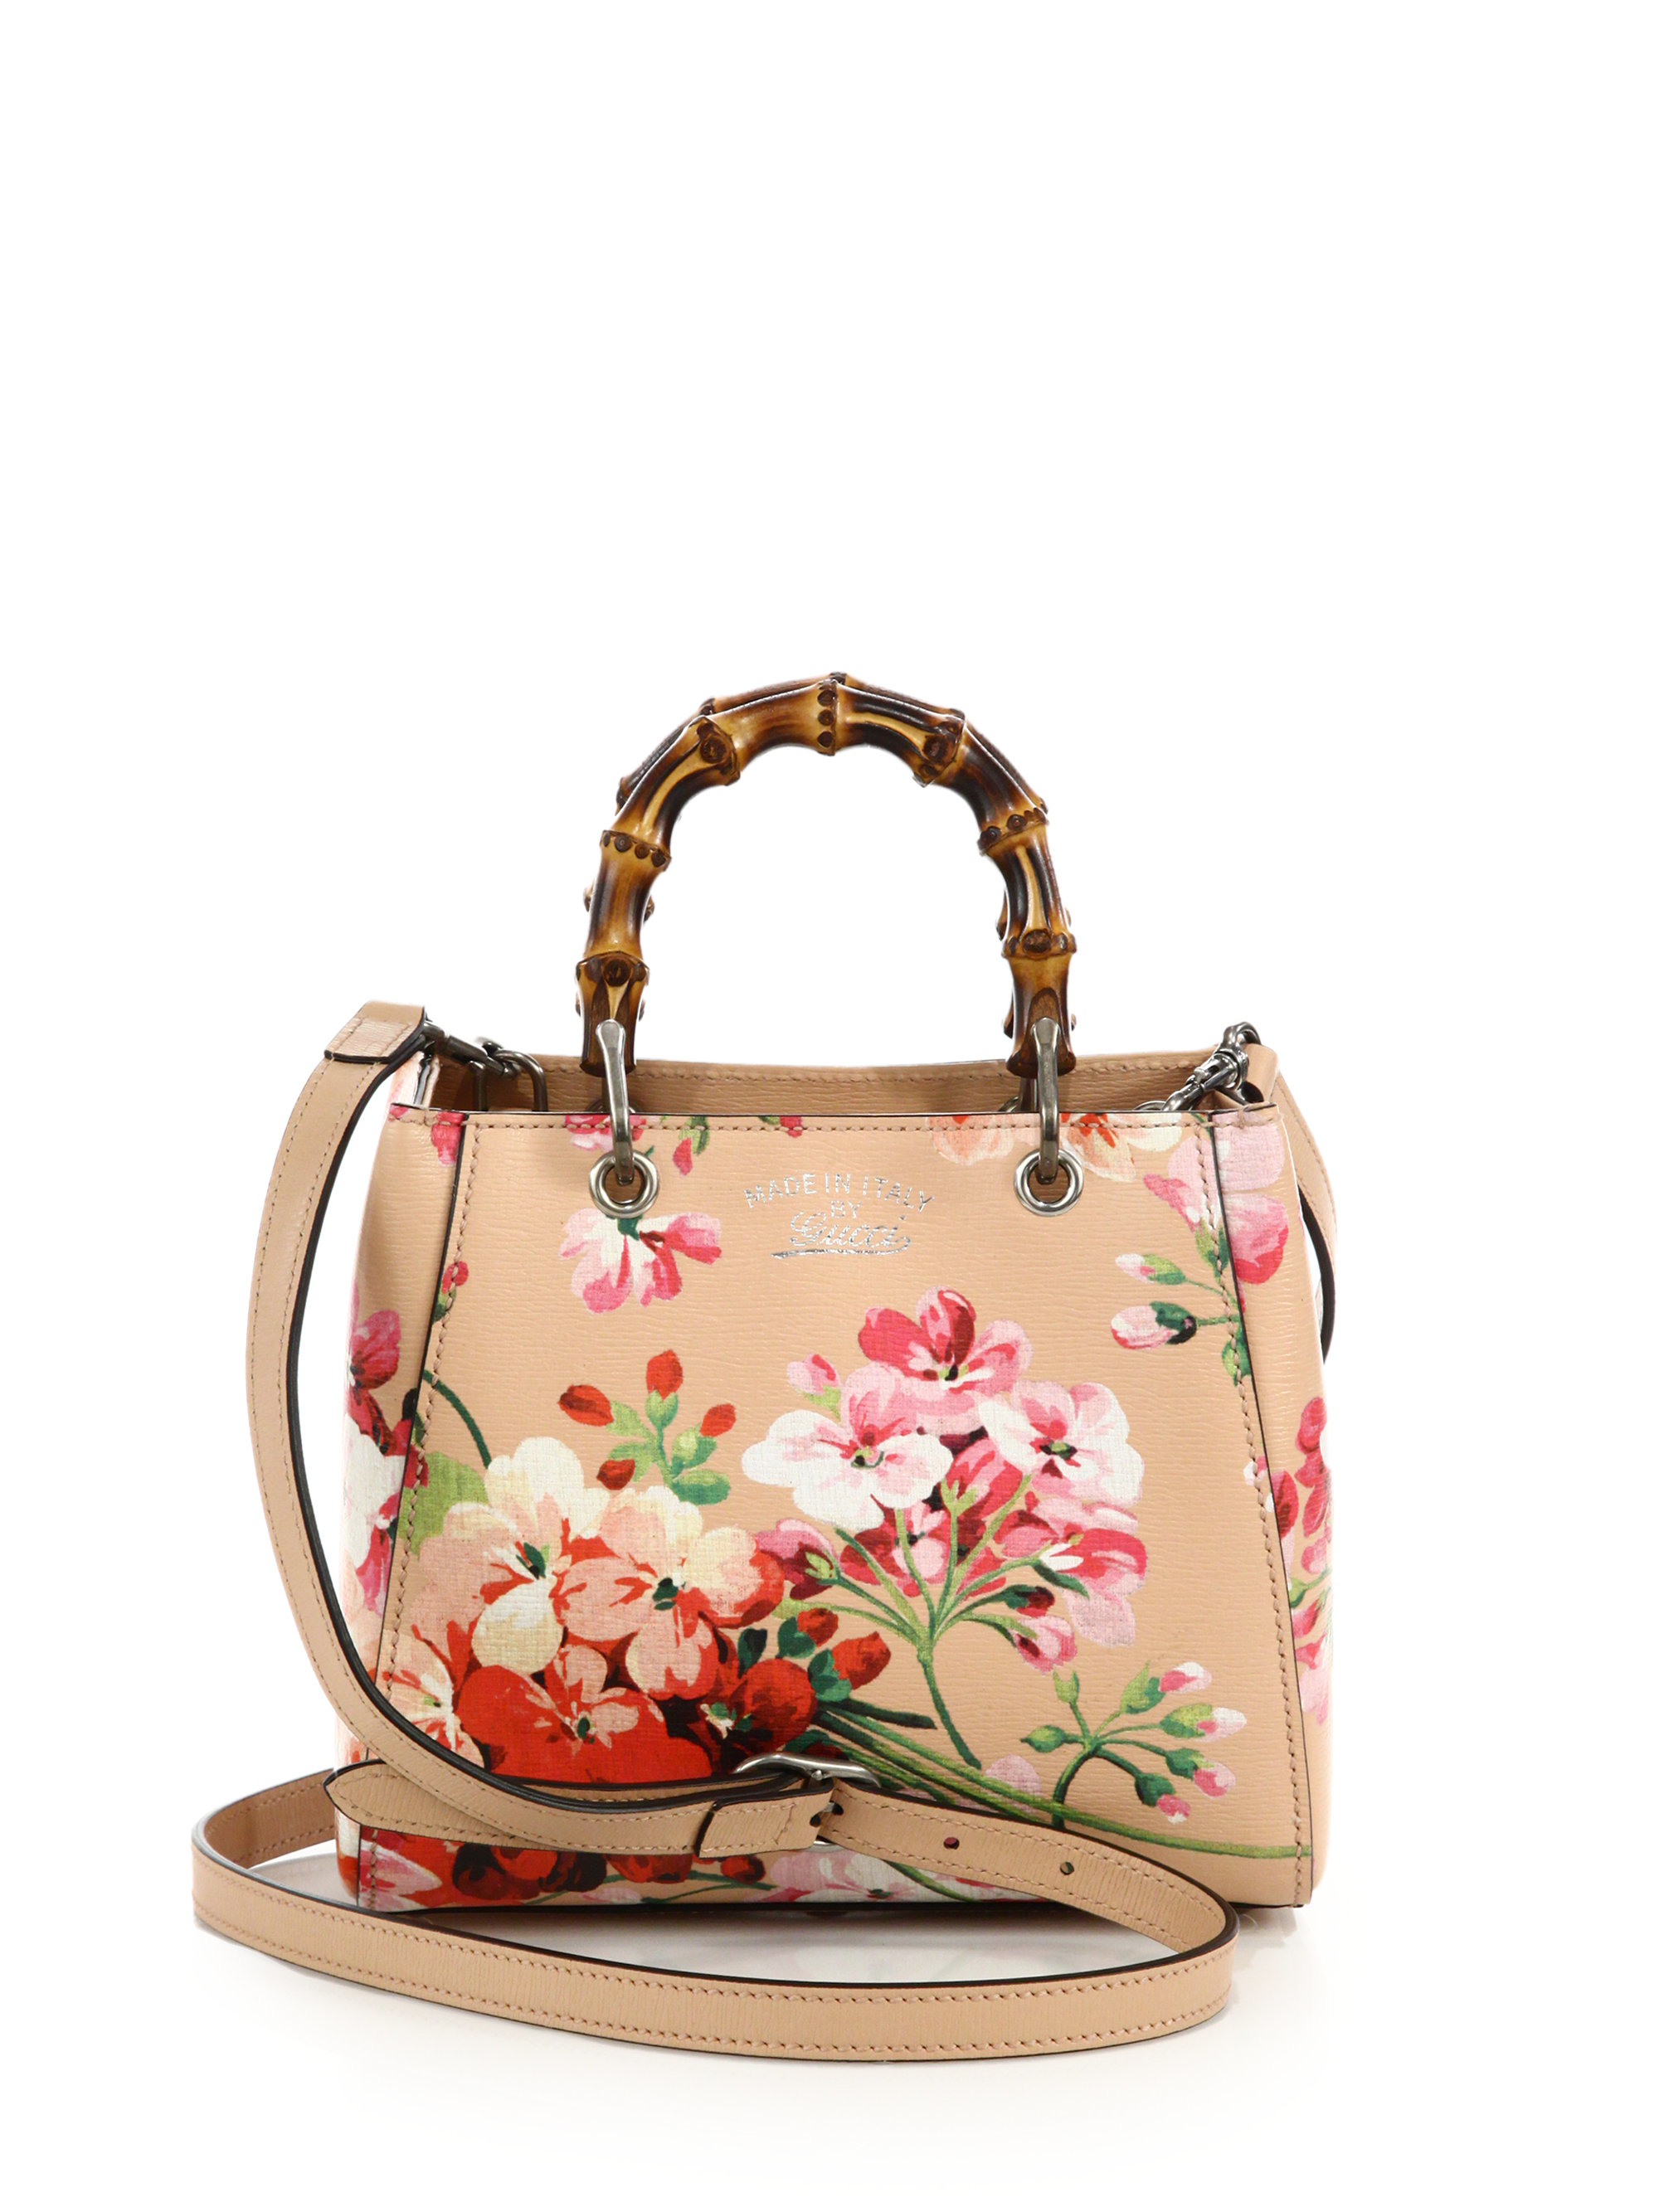 b1b8102713b3 Gucci Bamboo Blooms Mini Leather Shoulder Bag - Lyst